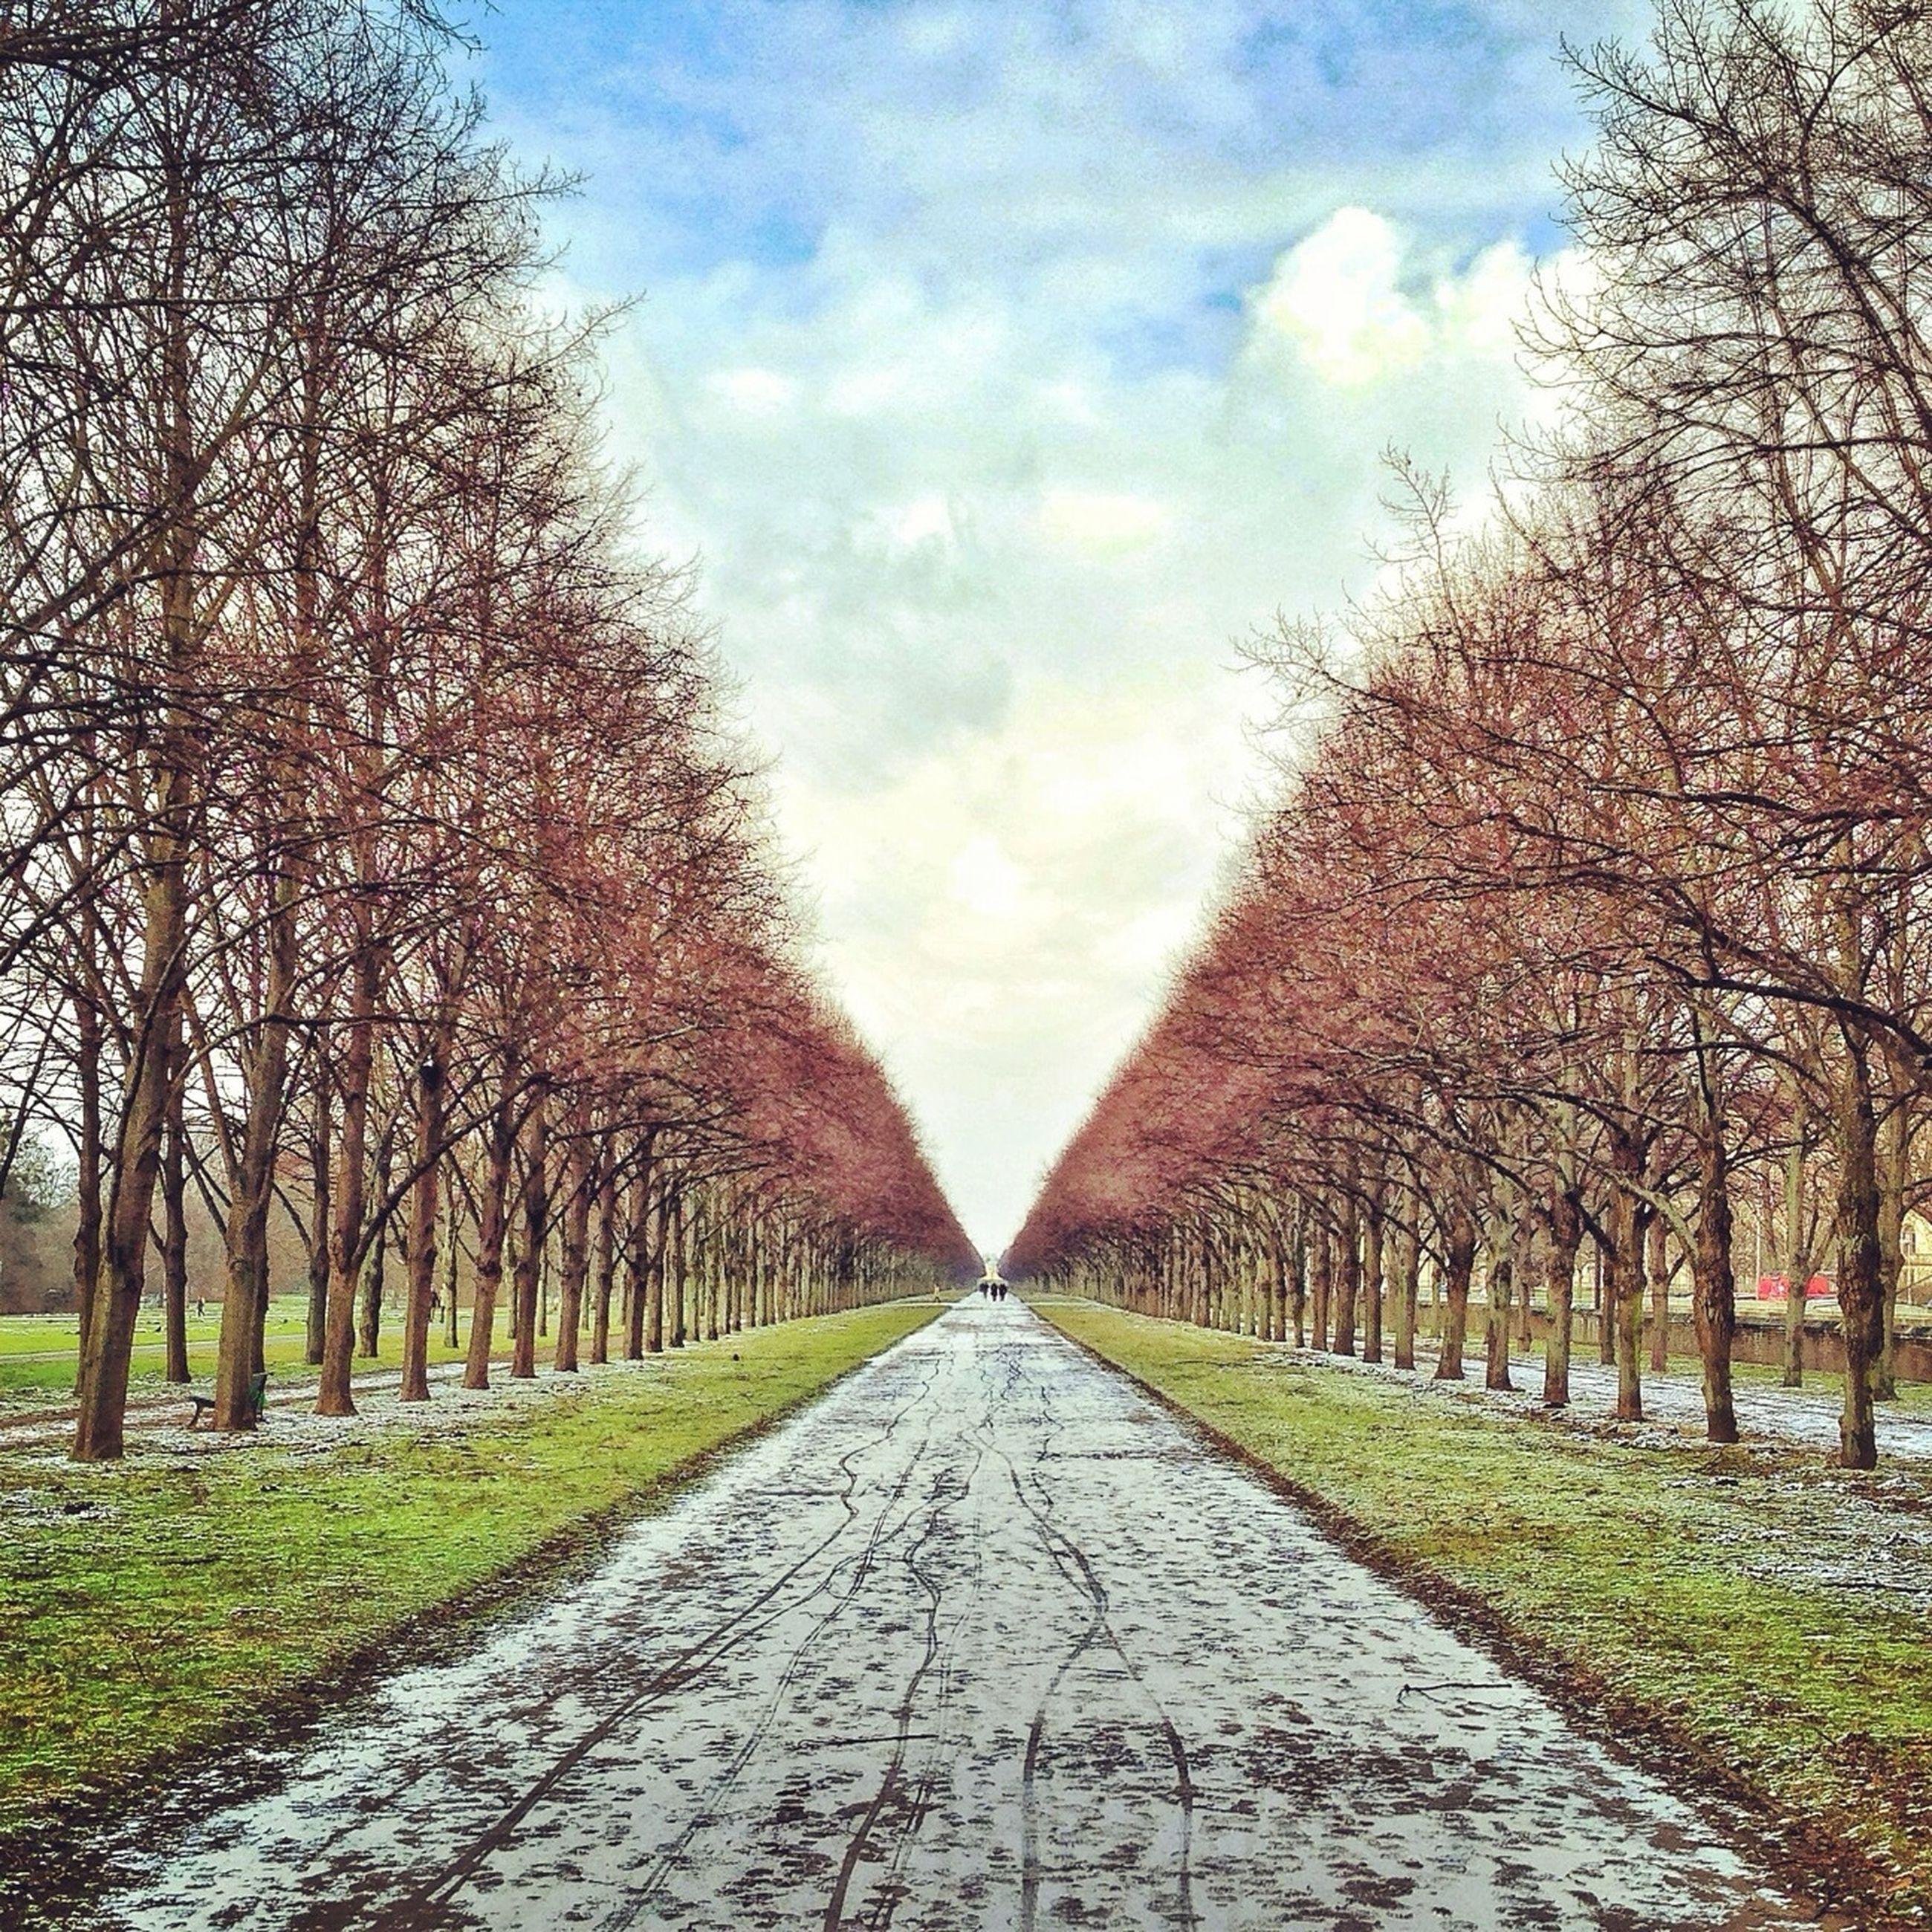 TREES ALONG FOOTPATH